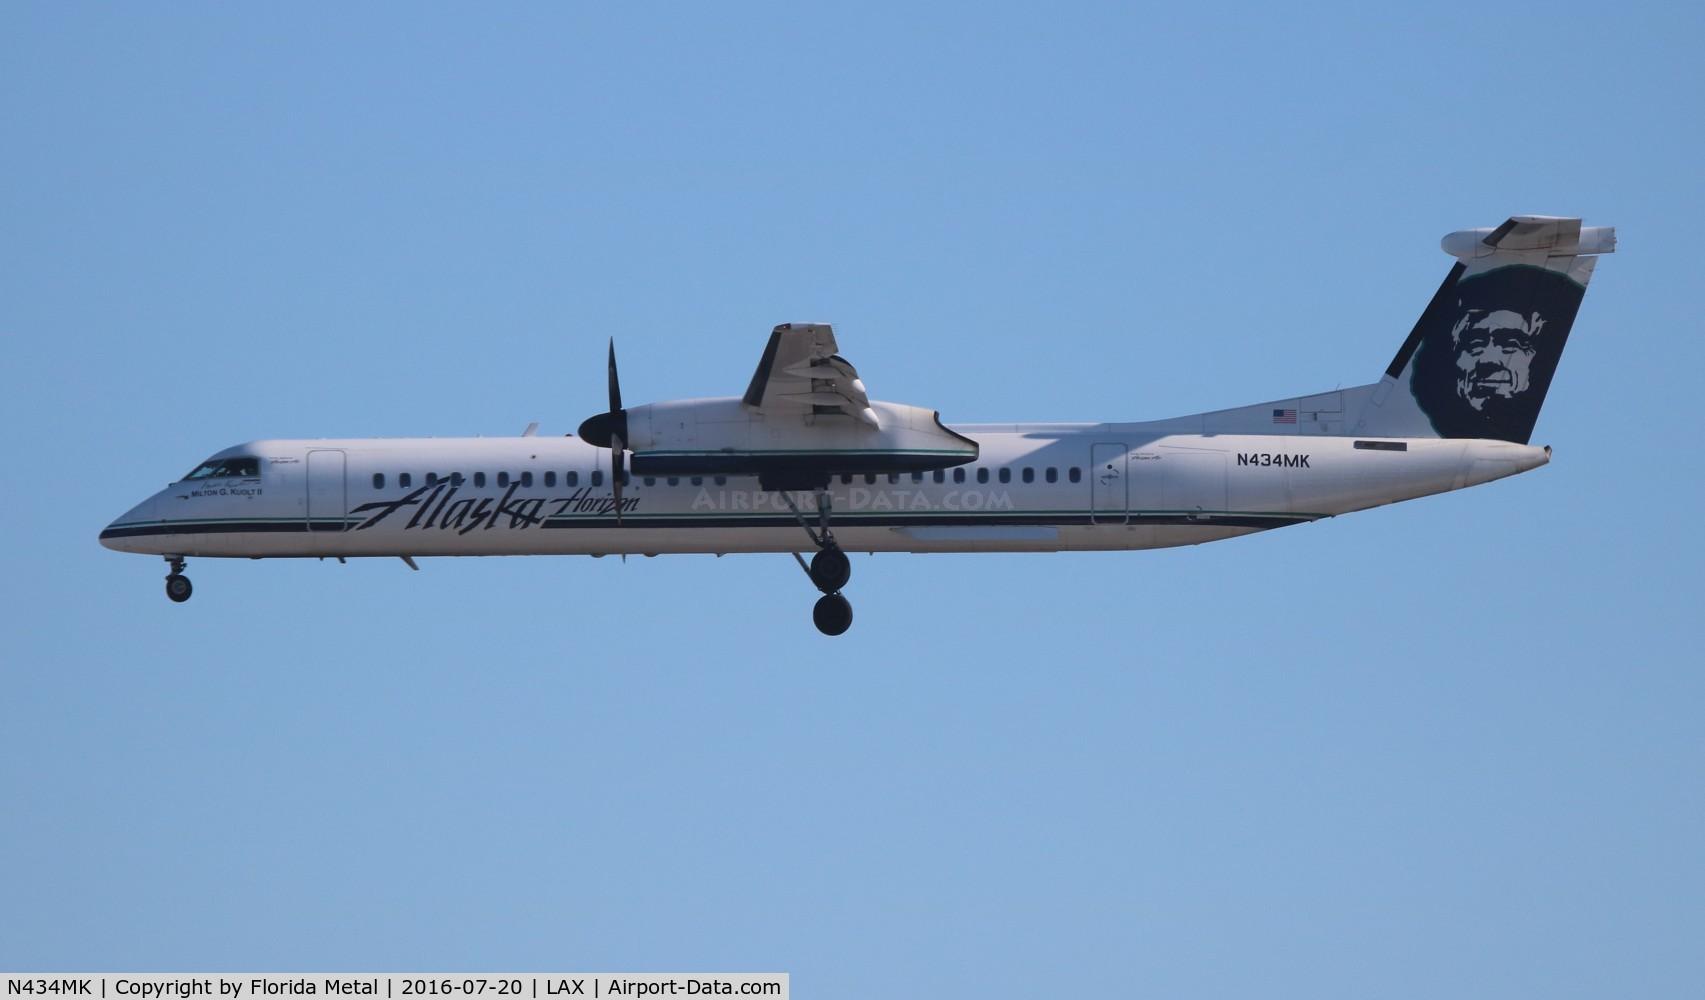 N434MK, 2008 Bombardier DHC-8-402 Dash 8 C/N 4227, Alaska